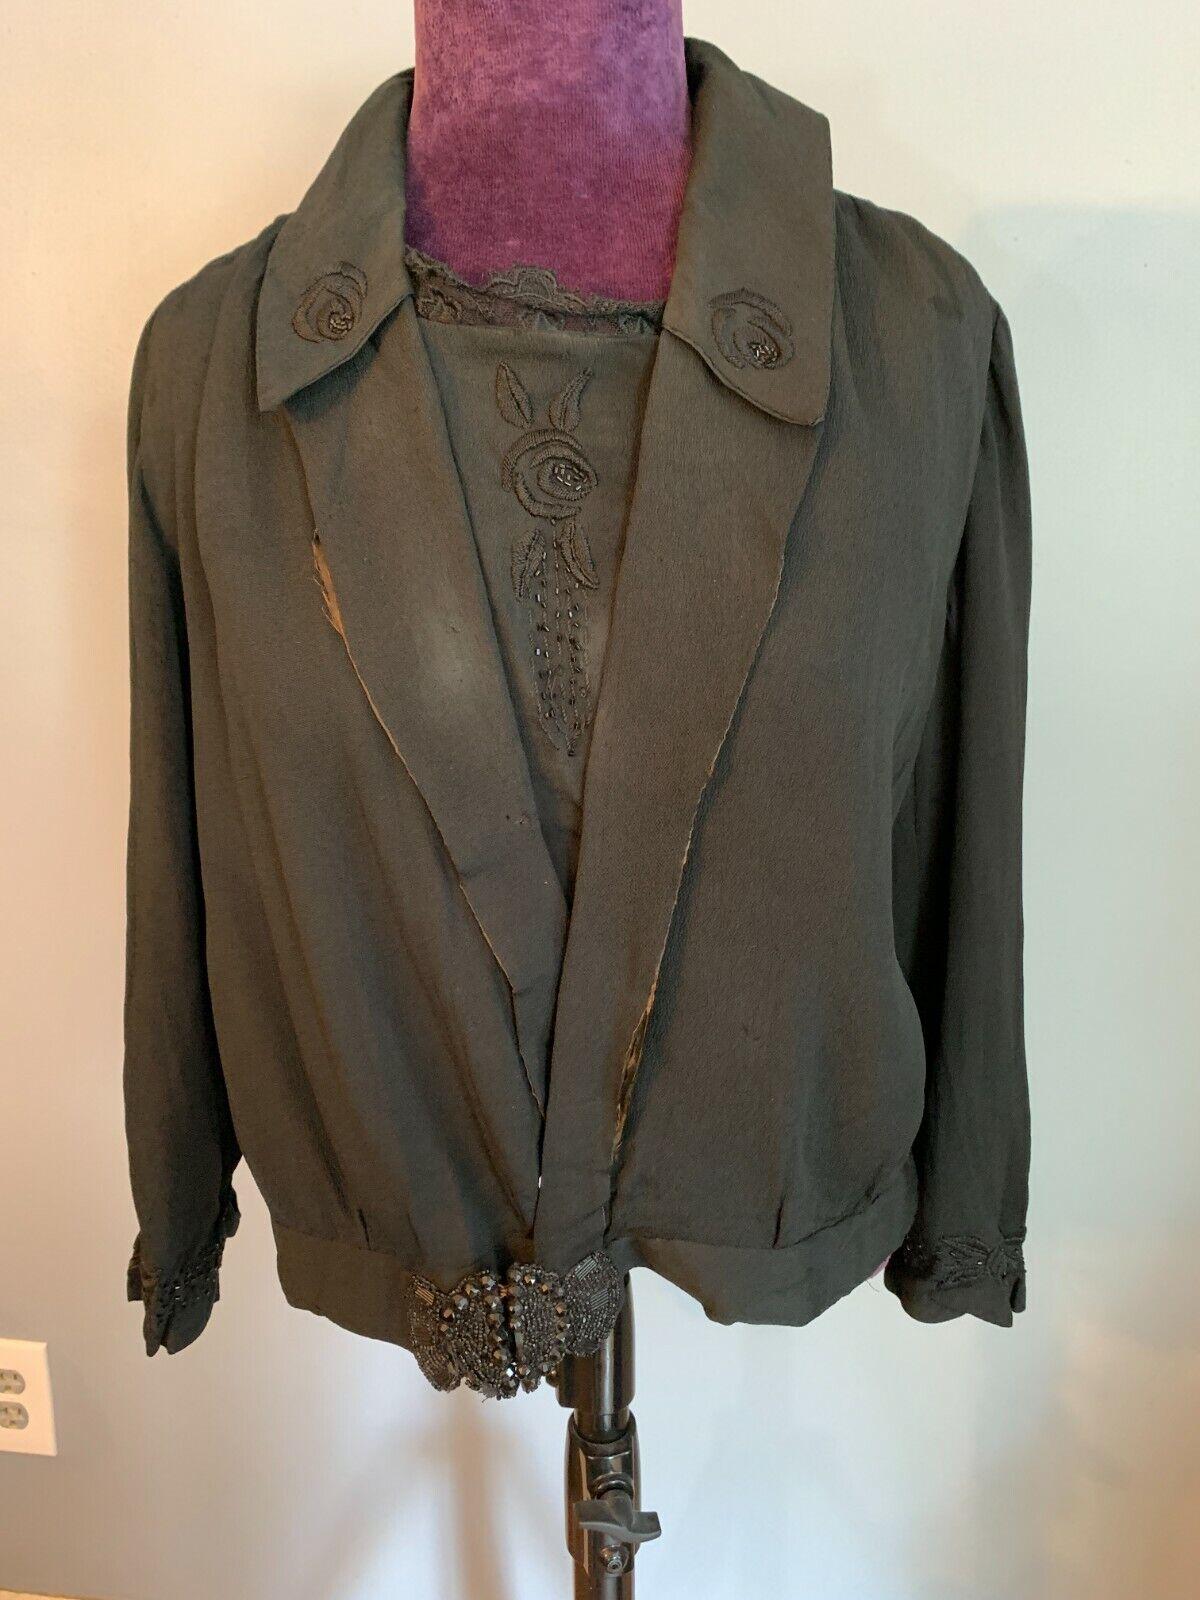 Antique Victorian Short Black Crepe early 1900s top shirt black